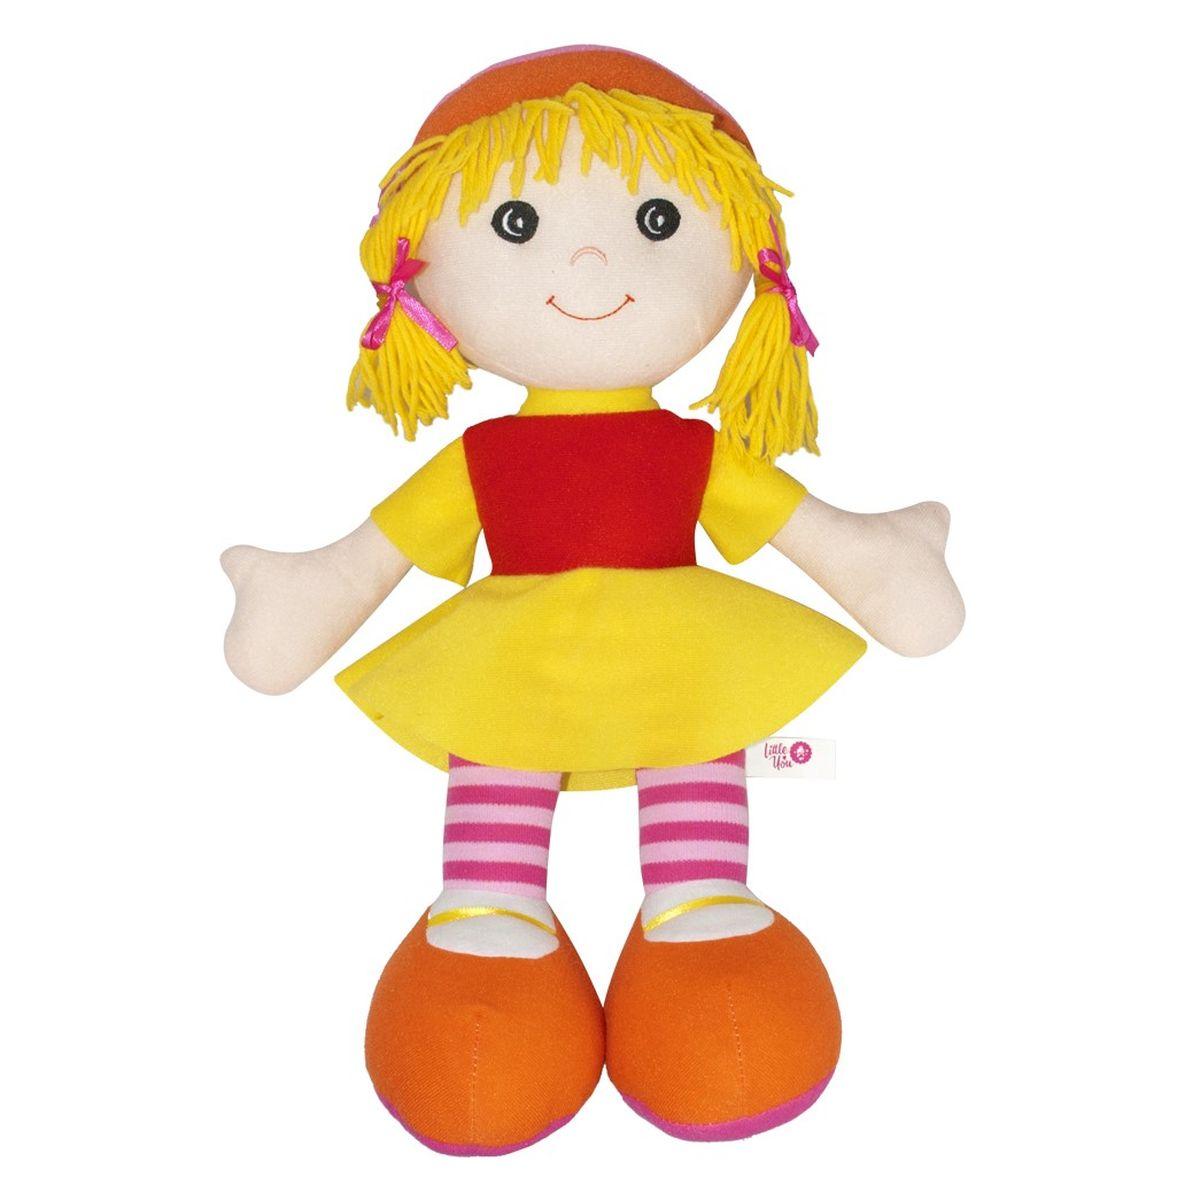 Фото - Little You Мягкая кукла Джейн little you мягкая кукла кейт цвет одежды голубой желтый